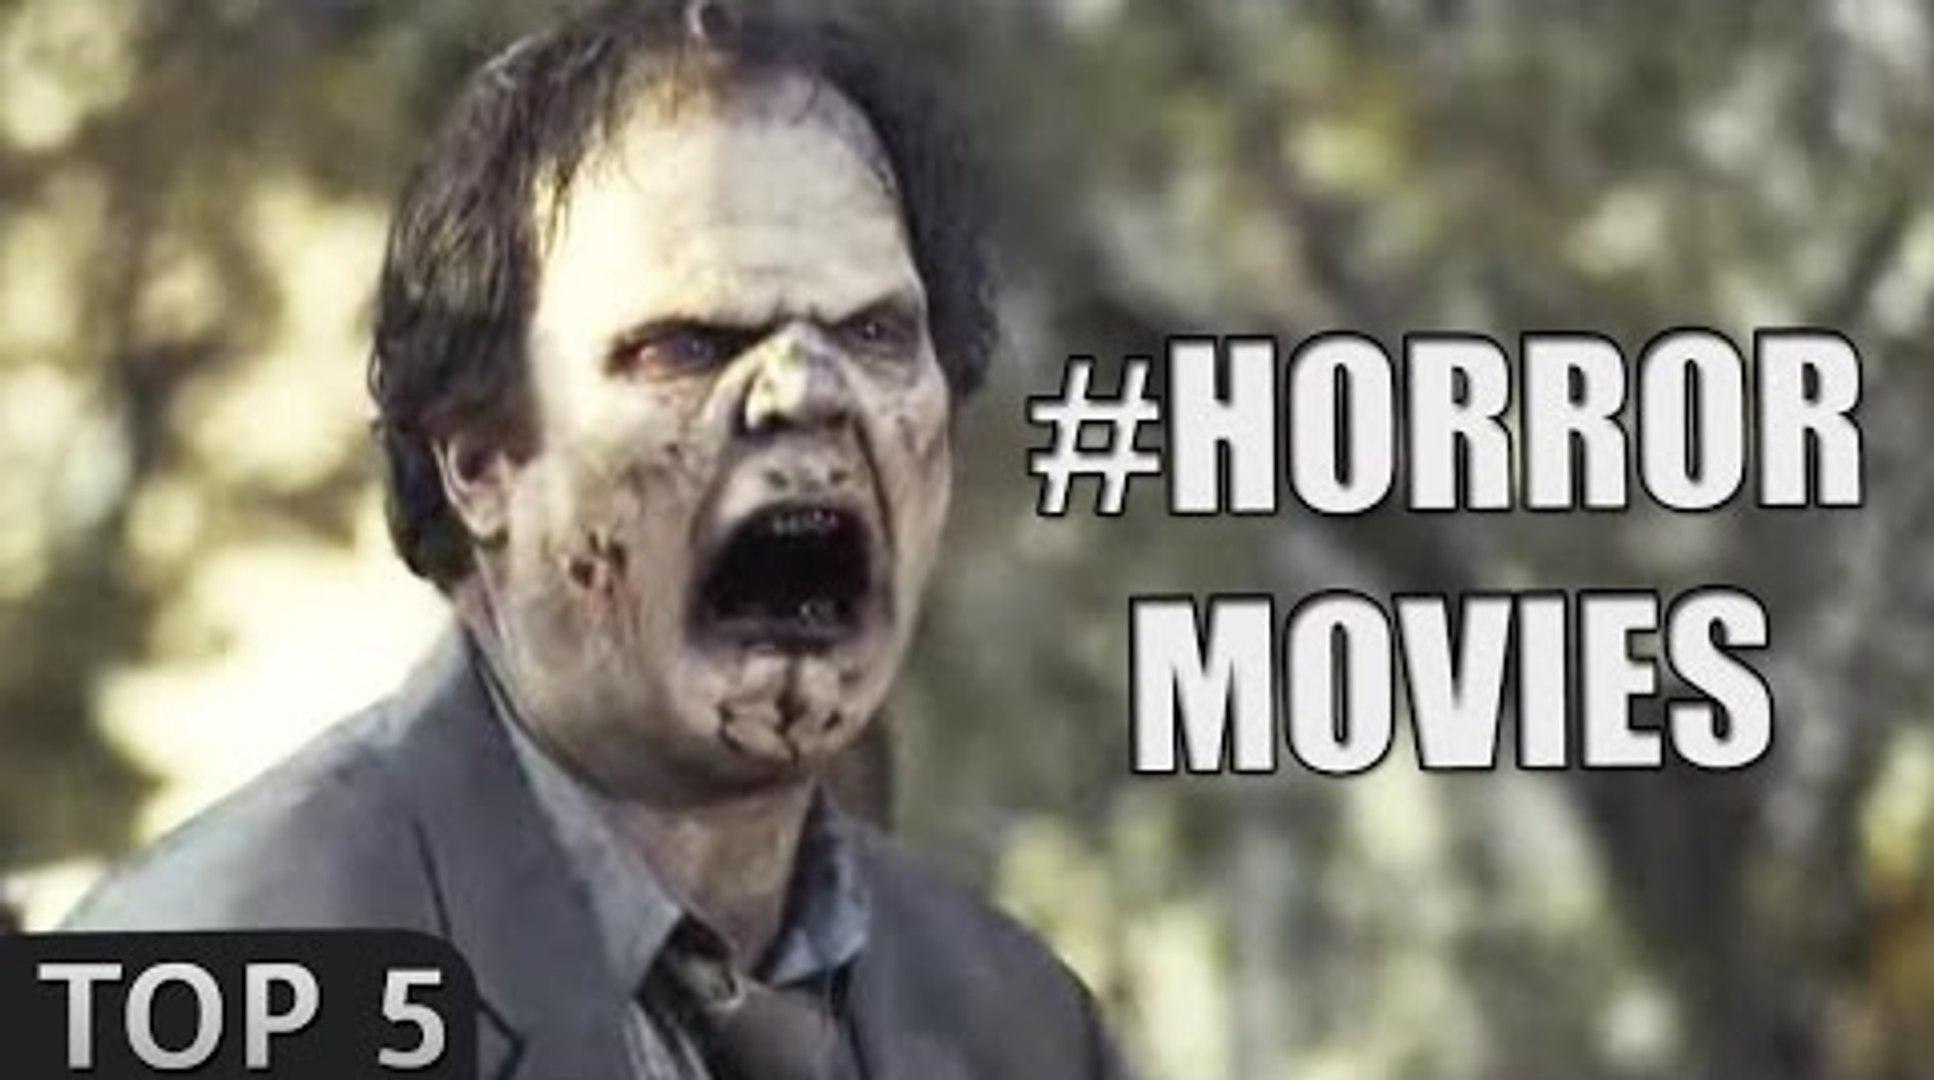 Top 5 Best Horror Movies parodies!